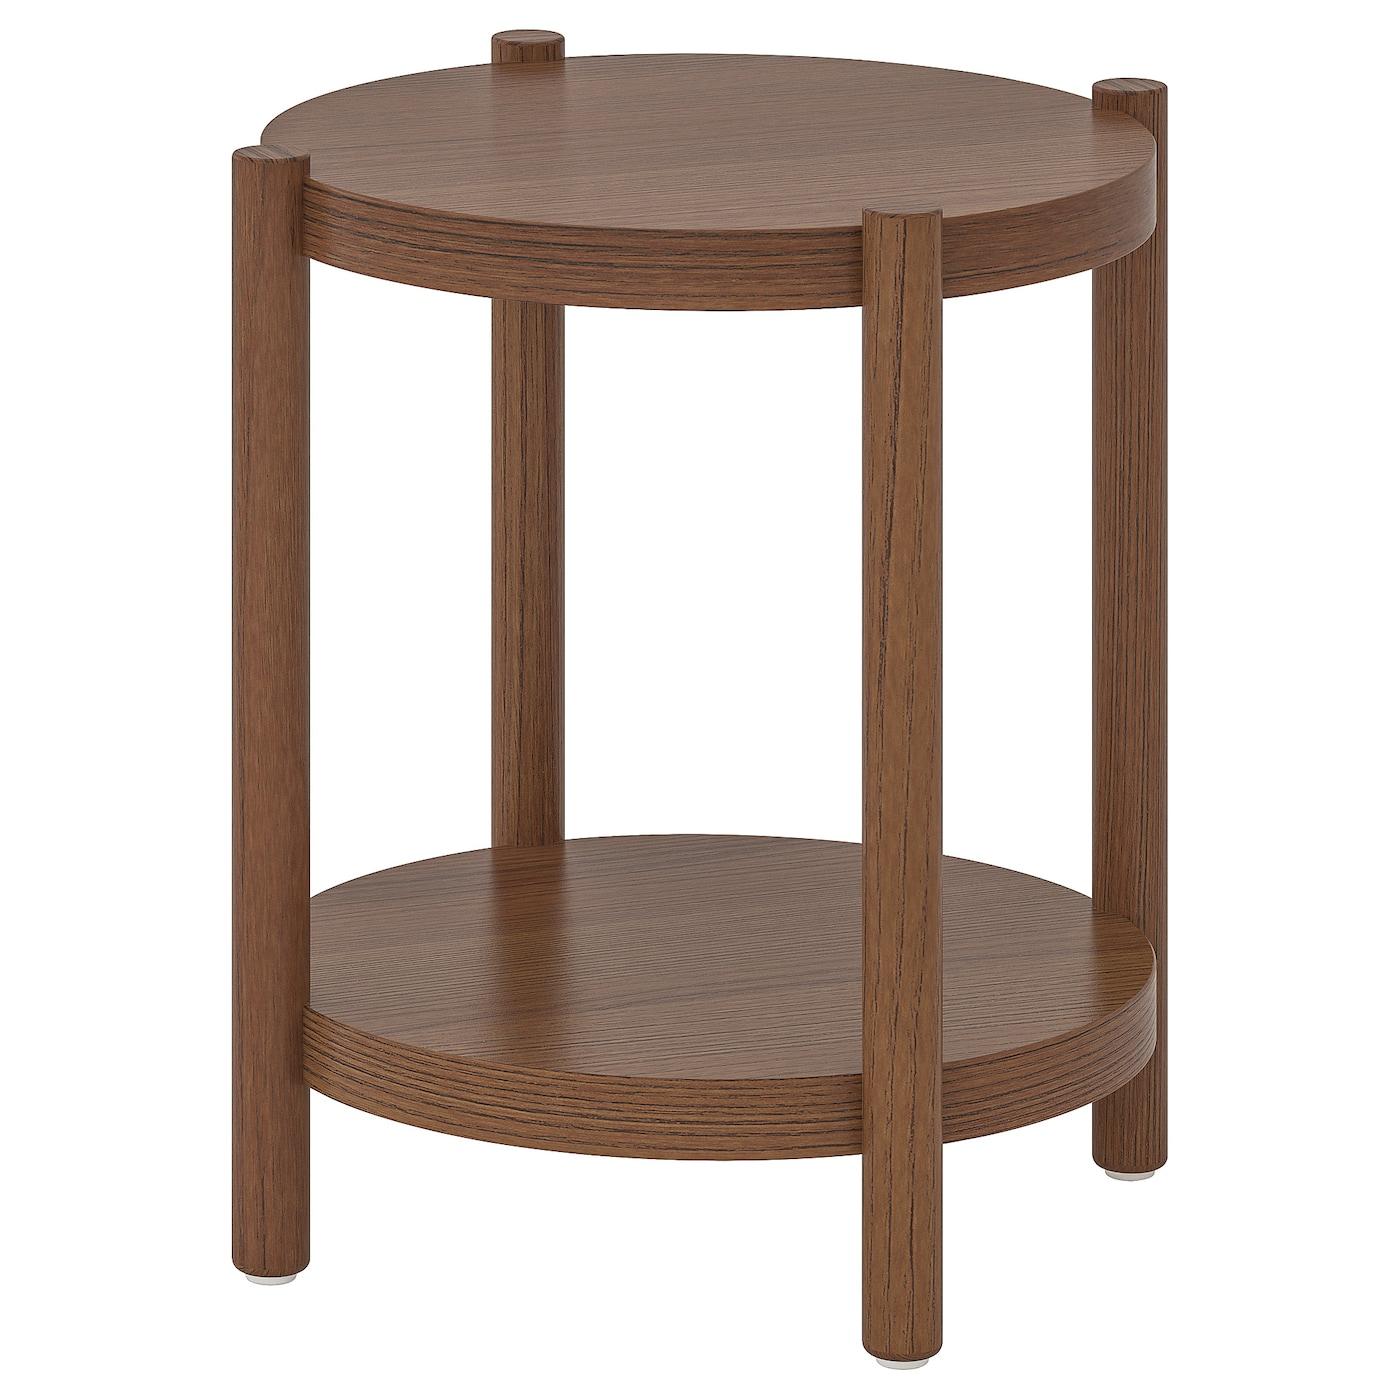 Listerby Side Table Brown 50 Cm Ikea [ 1400 x 1400 Pixel ]